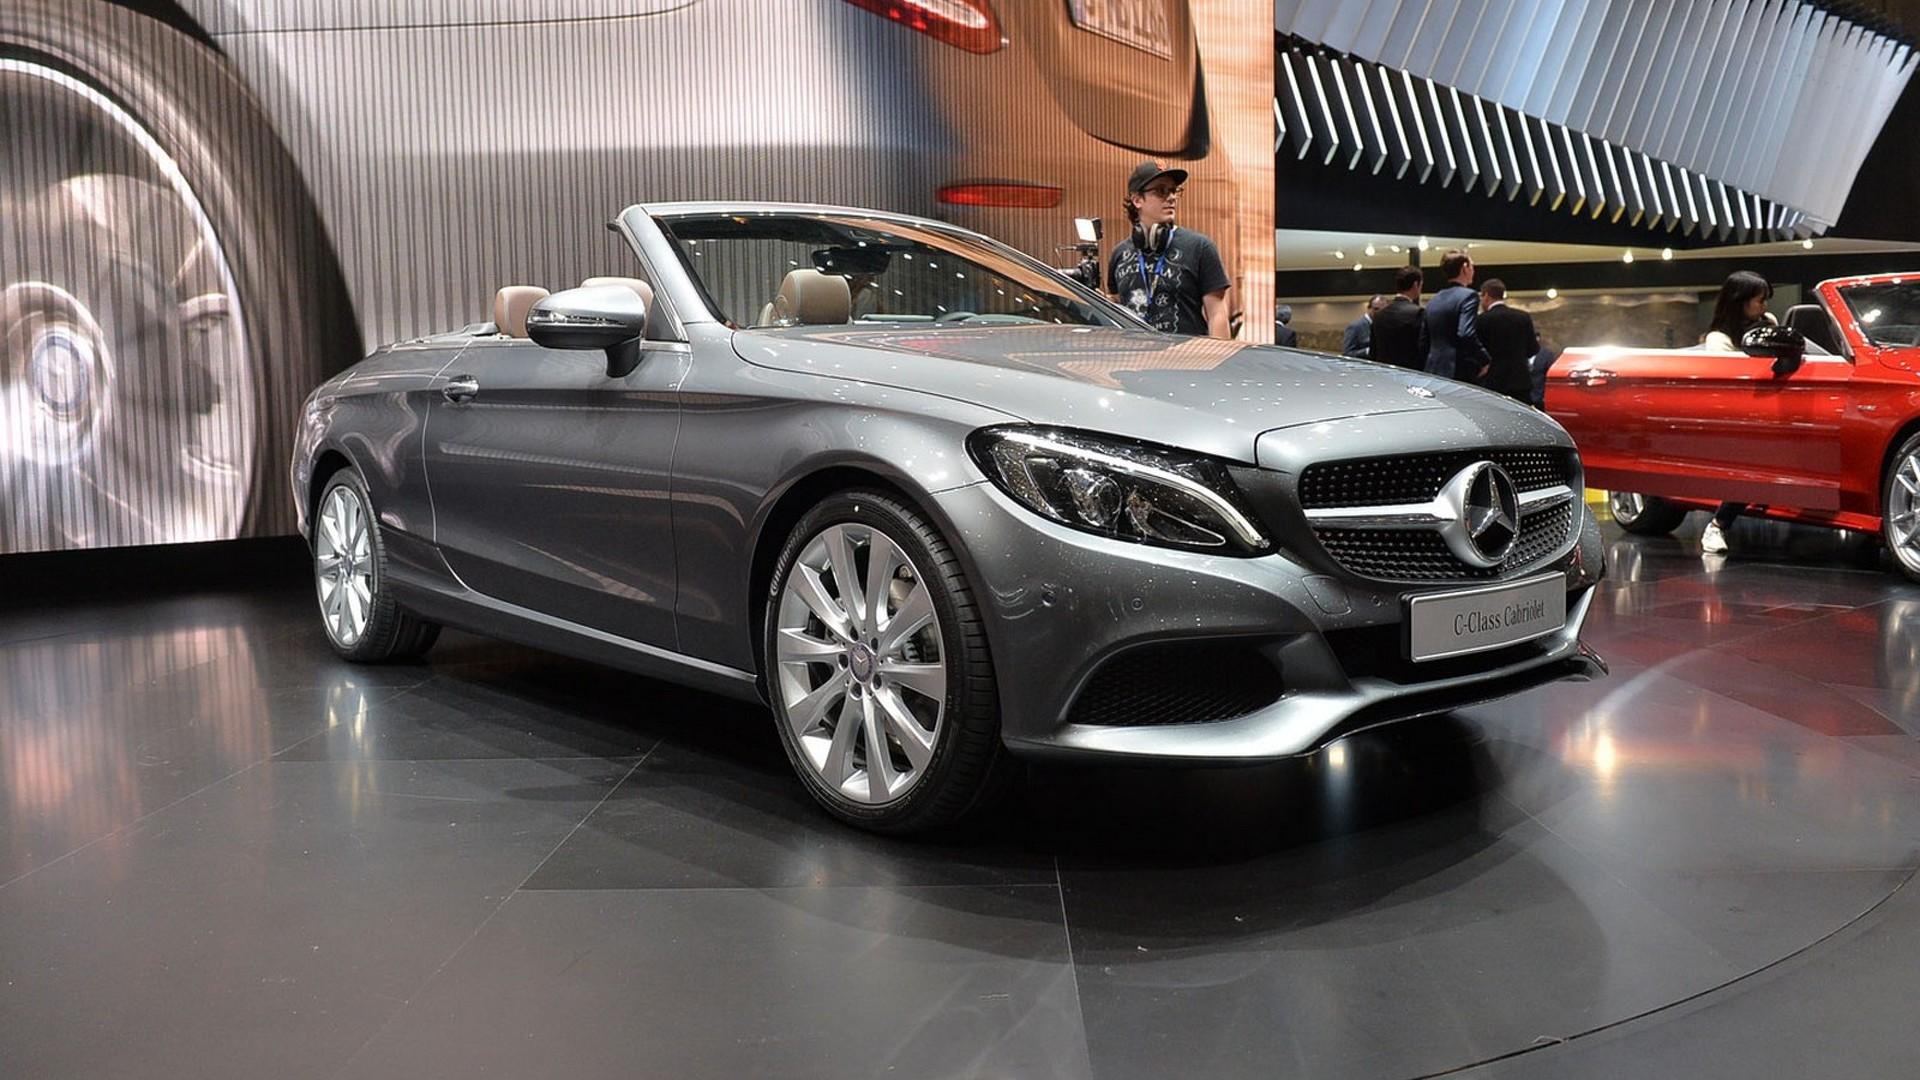 Mercedes Benz C Class Cabriolet News And Reviews